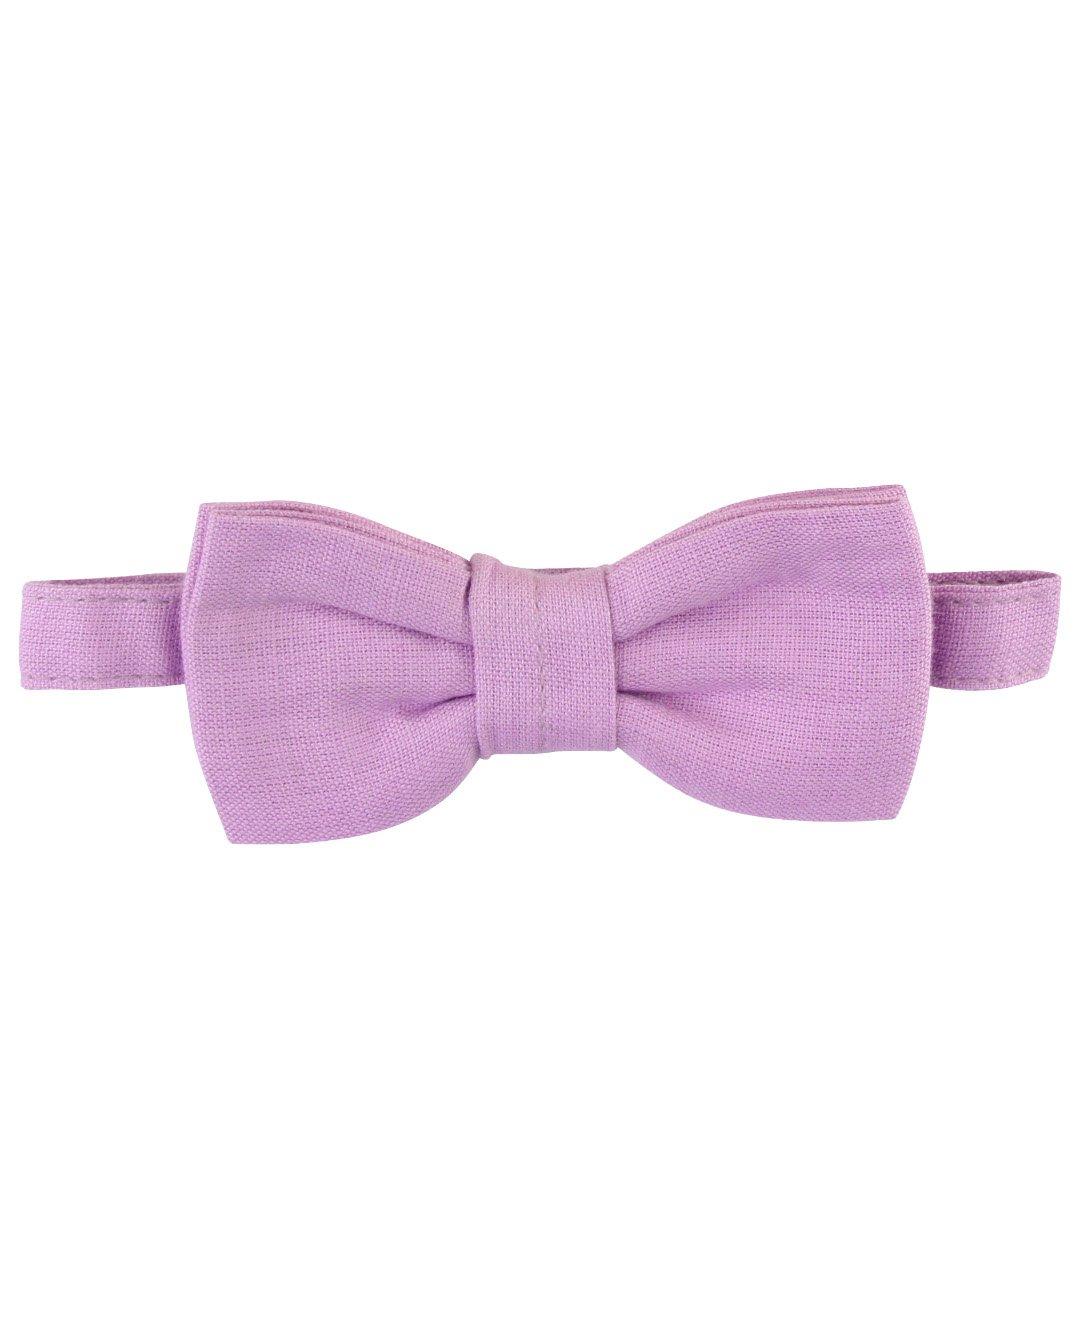 RuggedButts Little Boys Lilac Linen Blend Bow Tie - 2T-4T